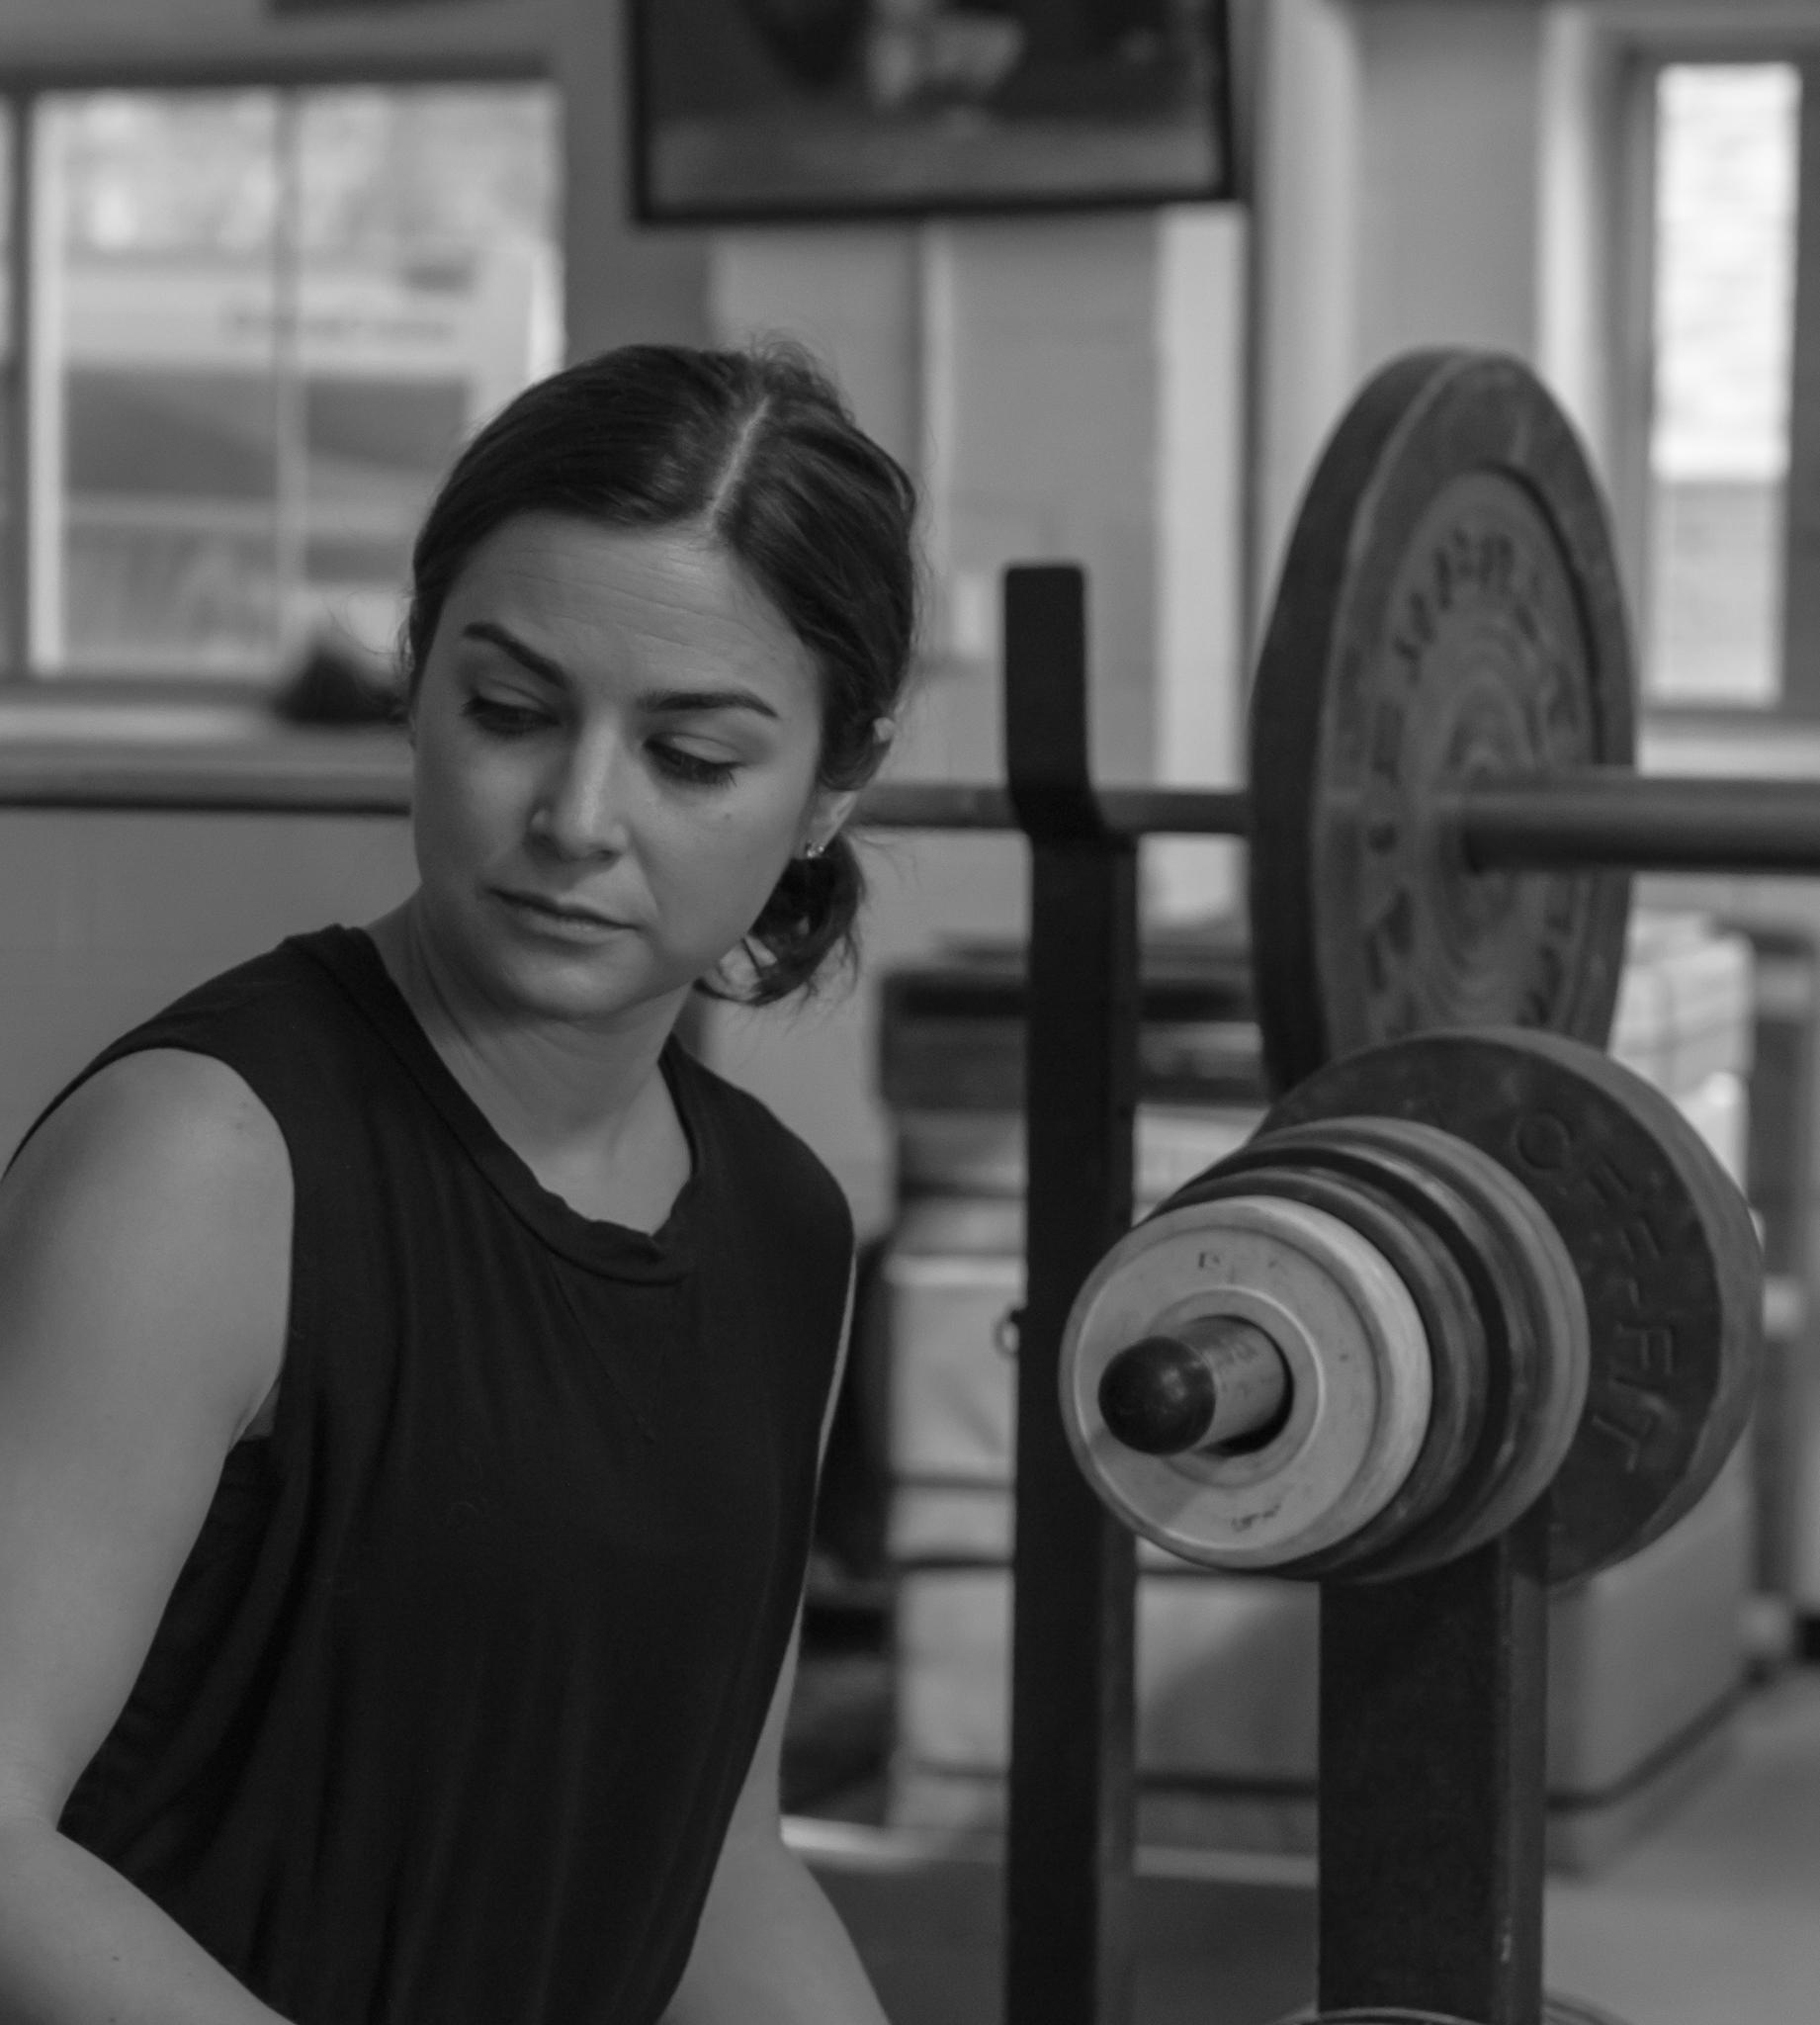 lauren-weightlifter-featured-everyday-lifter-new-york-weightlifting-academy